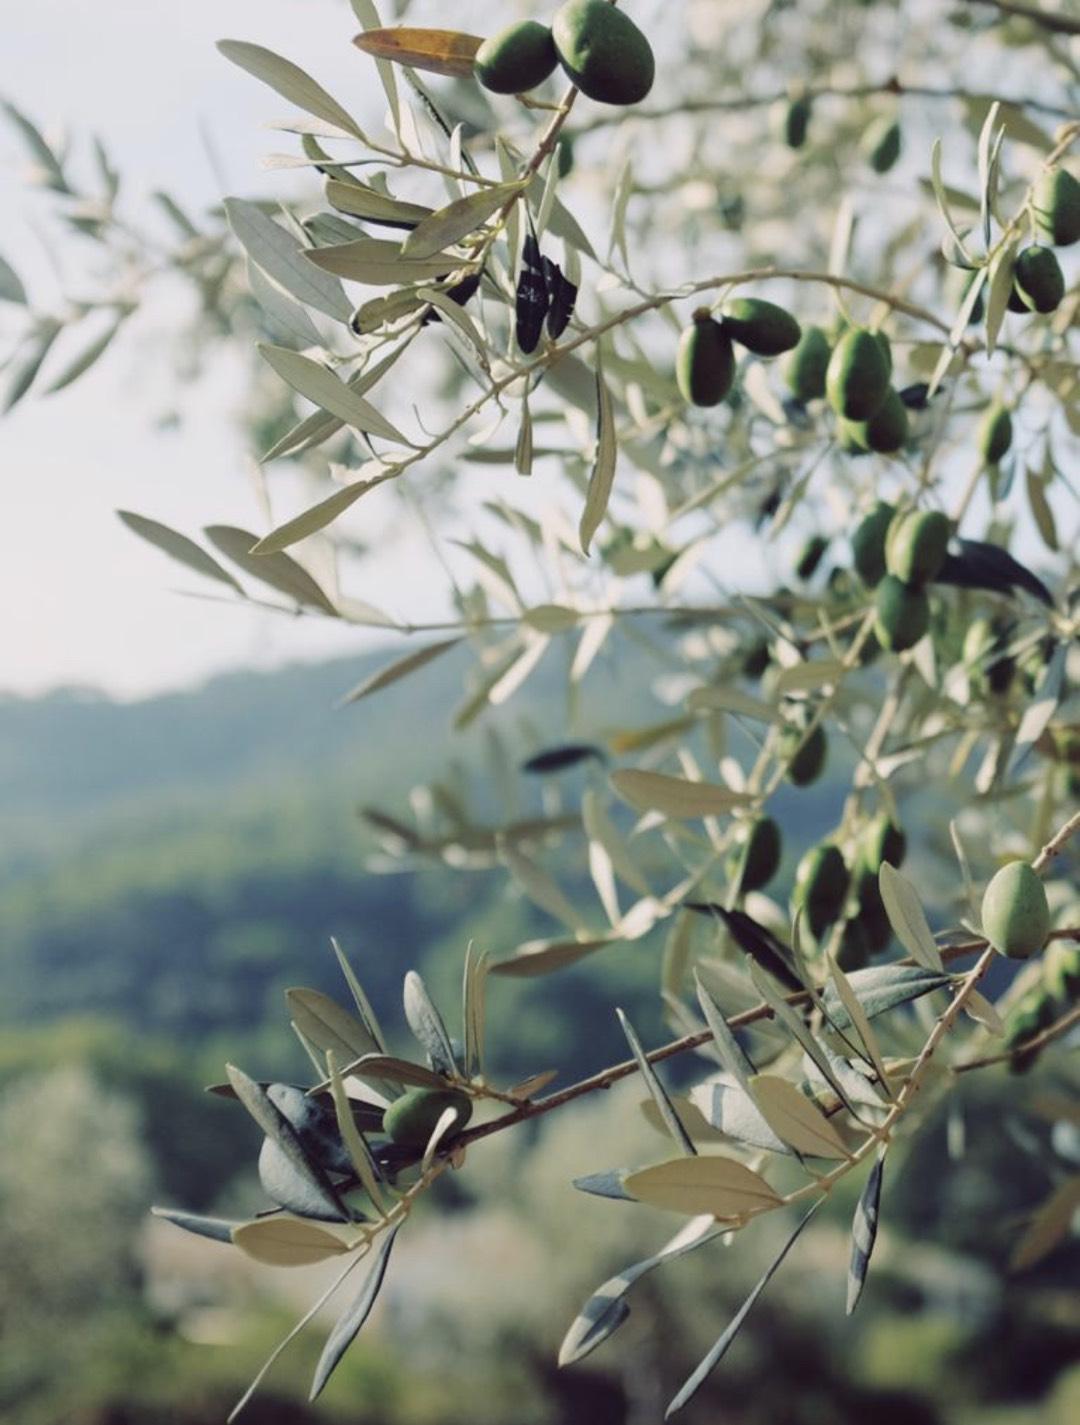 Olivenblätter als Superfood bei den Dos Alquemistas